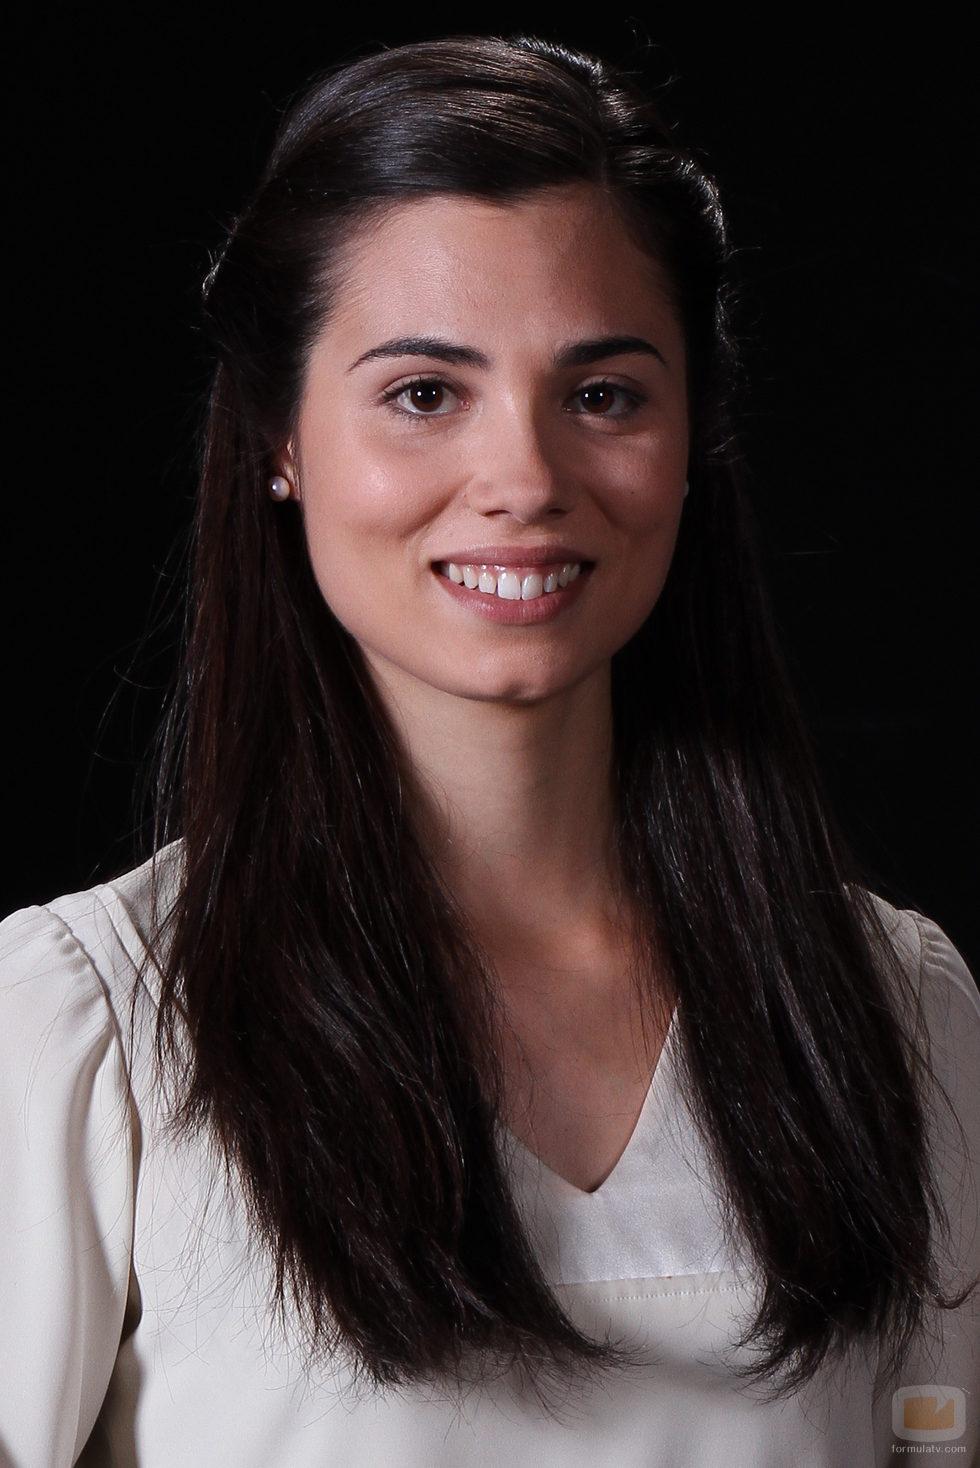 Loreto Mauleón, nuevo fichaje de 'El secreto de Puente Viejo'